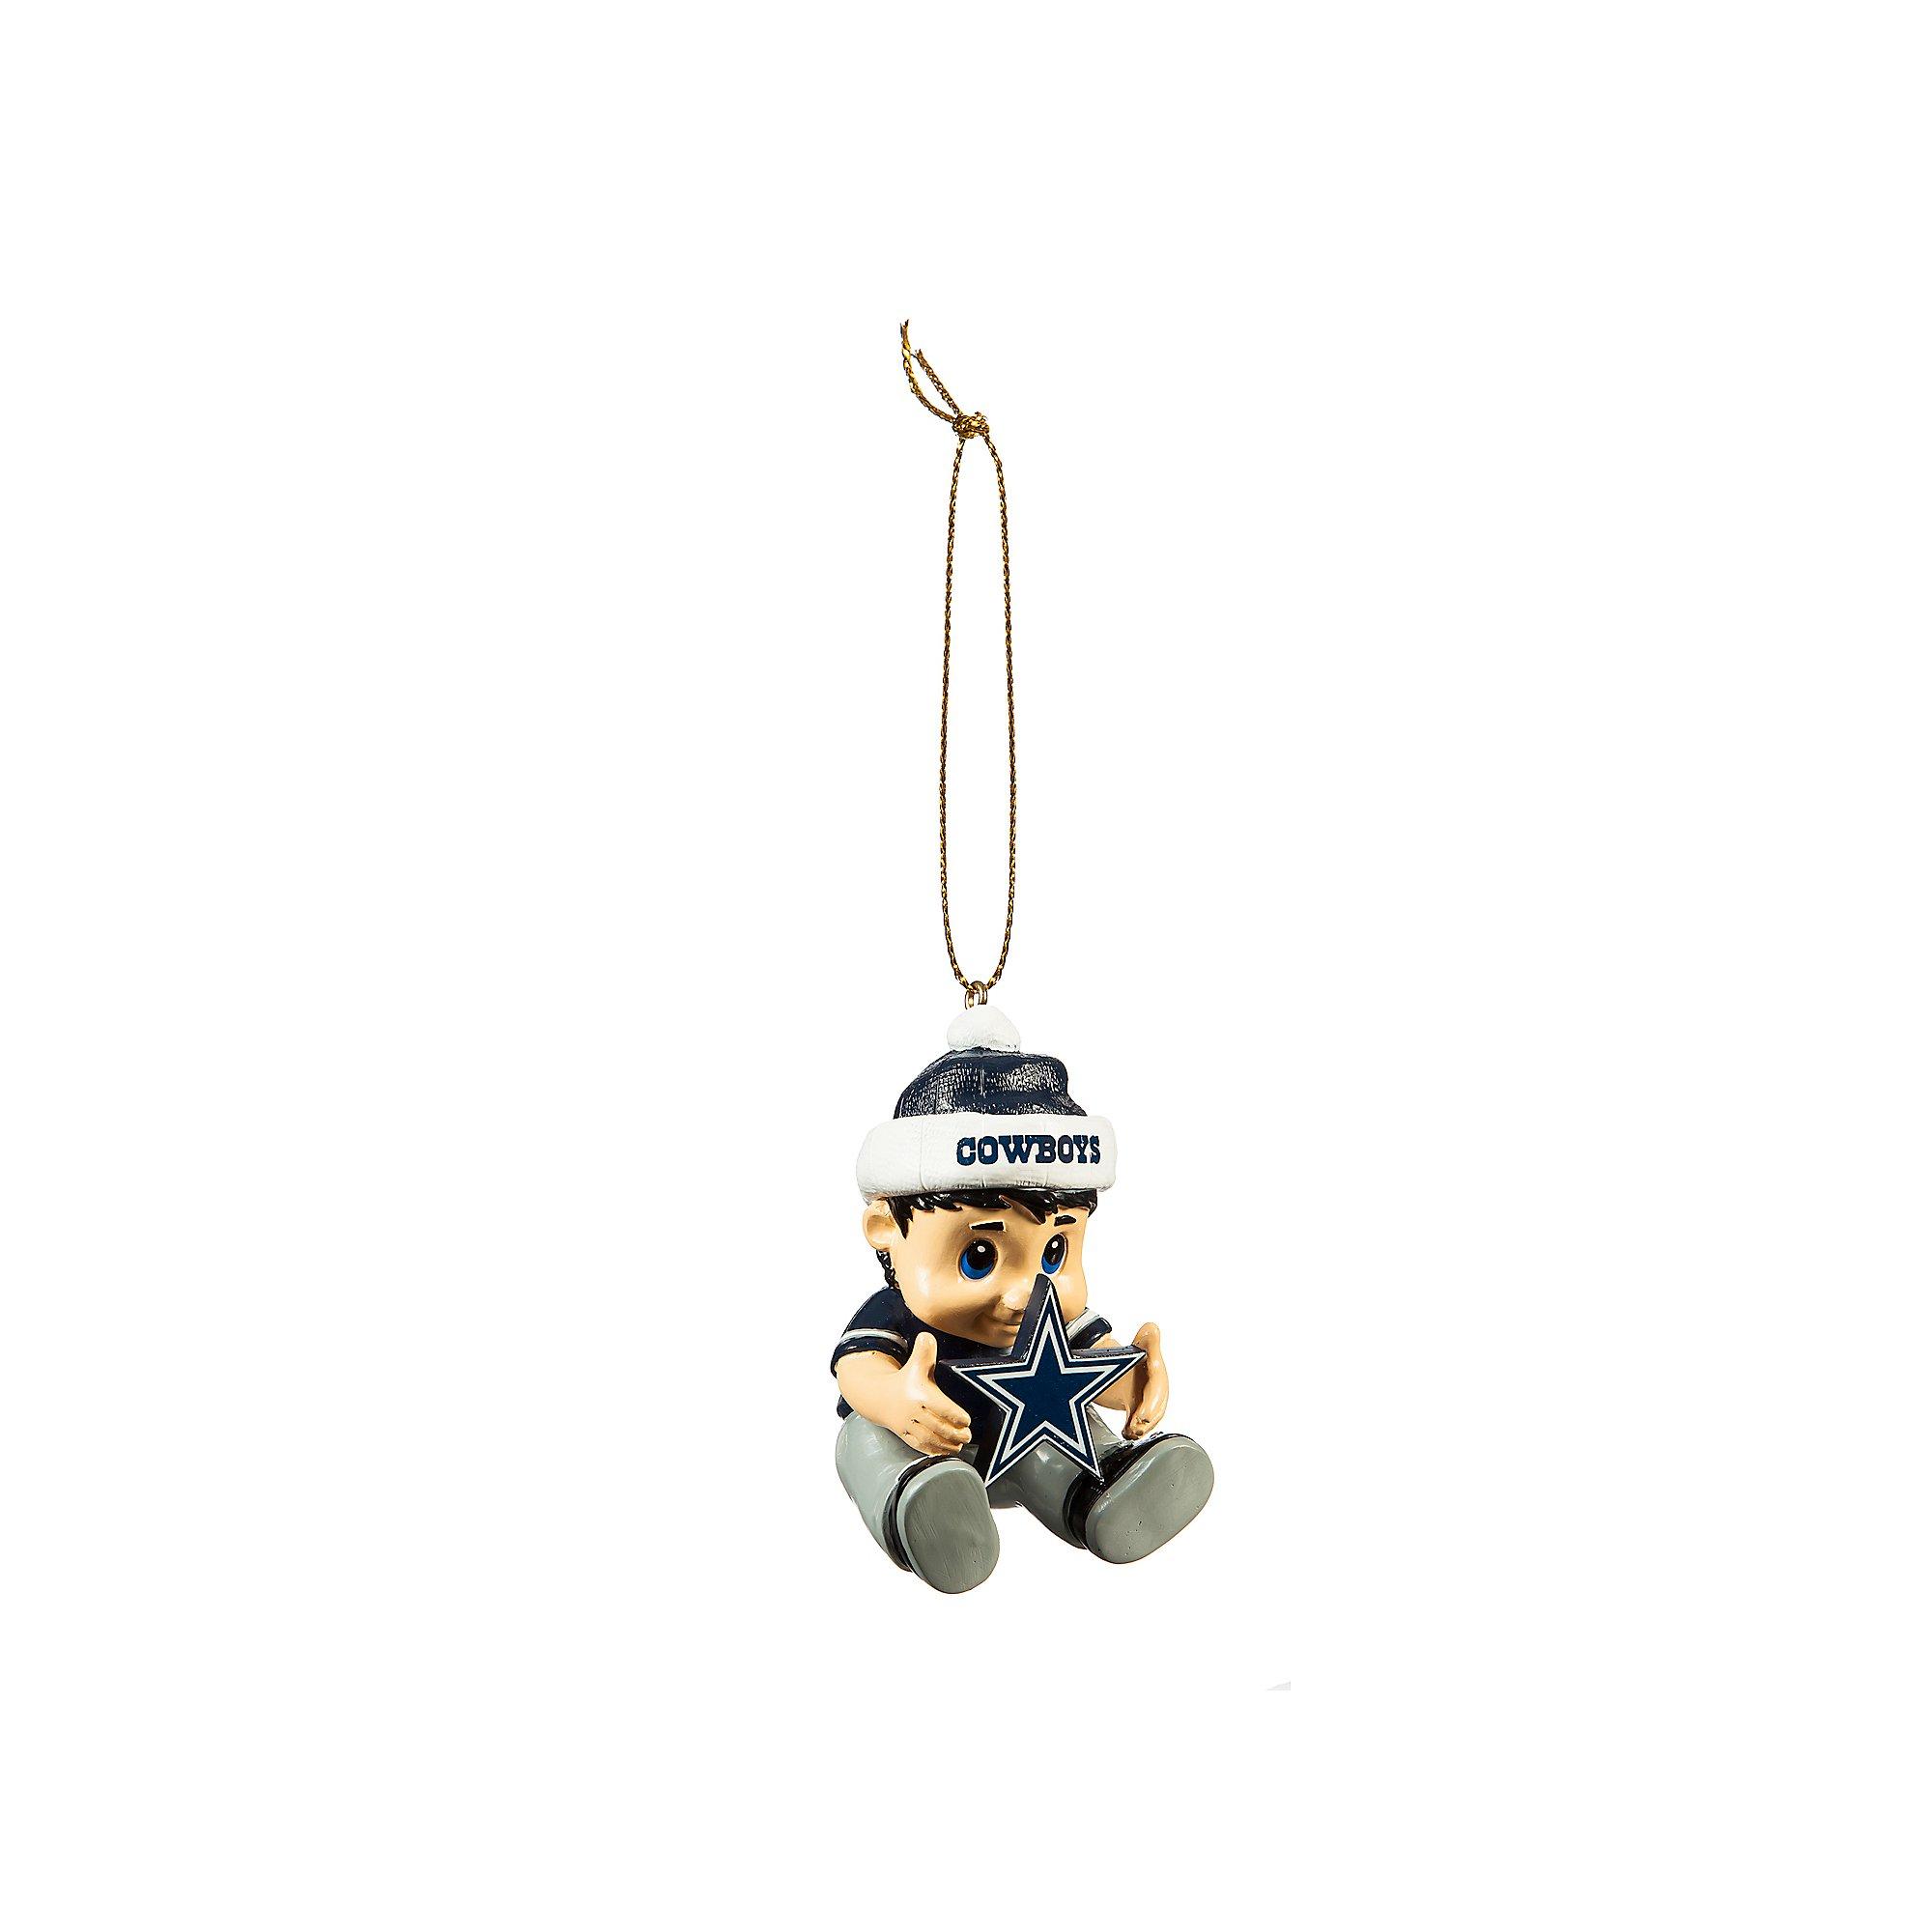 Dallas Cowboys Little Fan Ornament